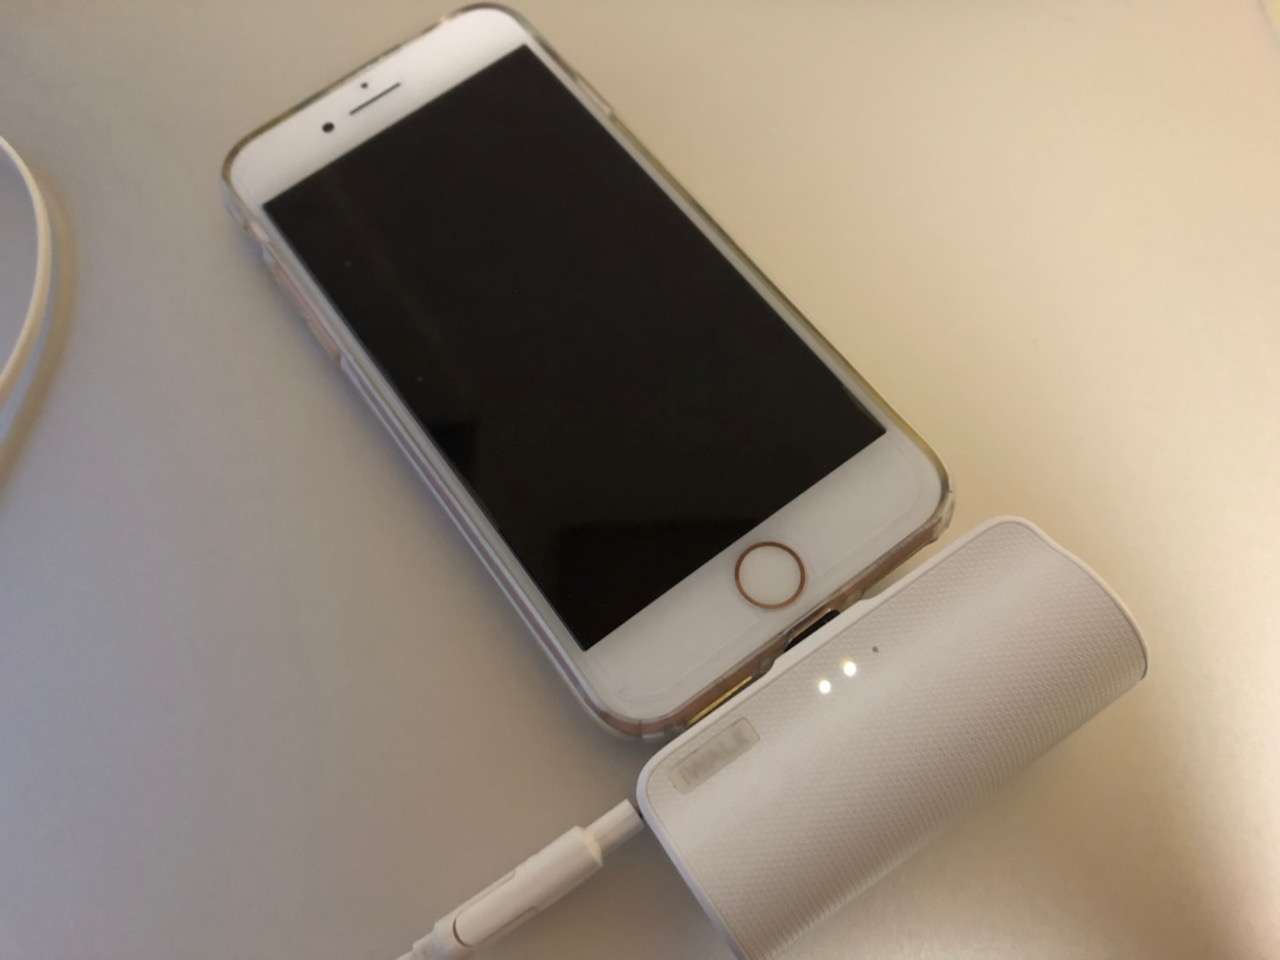 iWALKの小型モバイルバッテリーのおすすめポイント